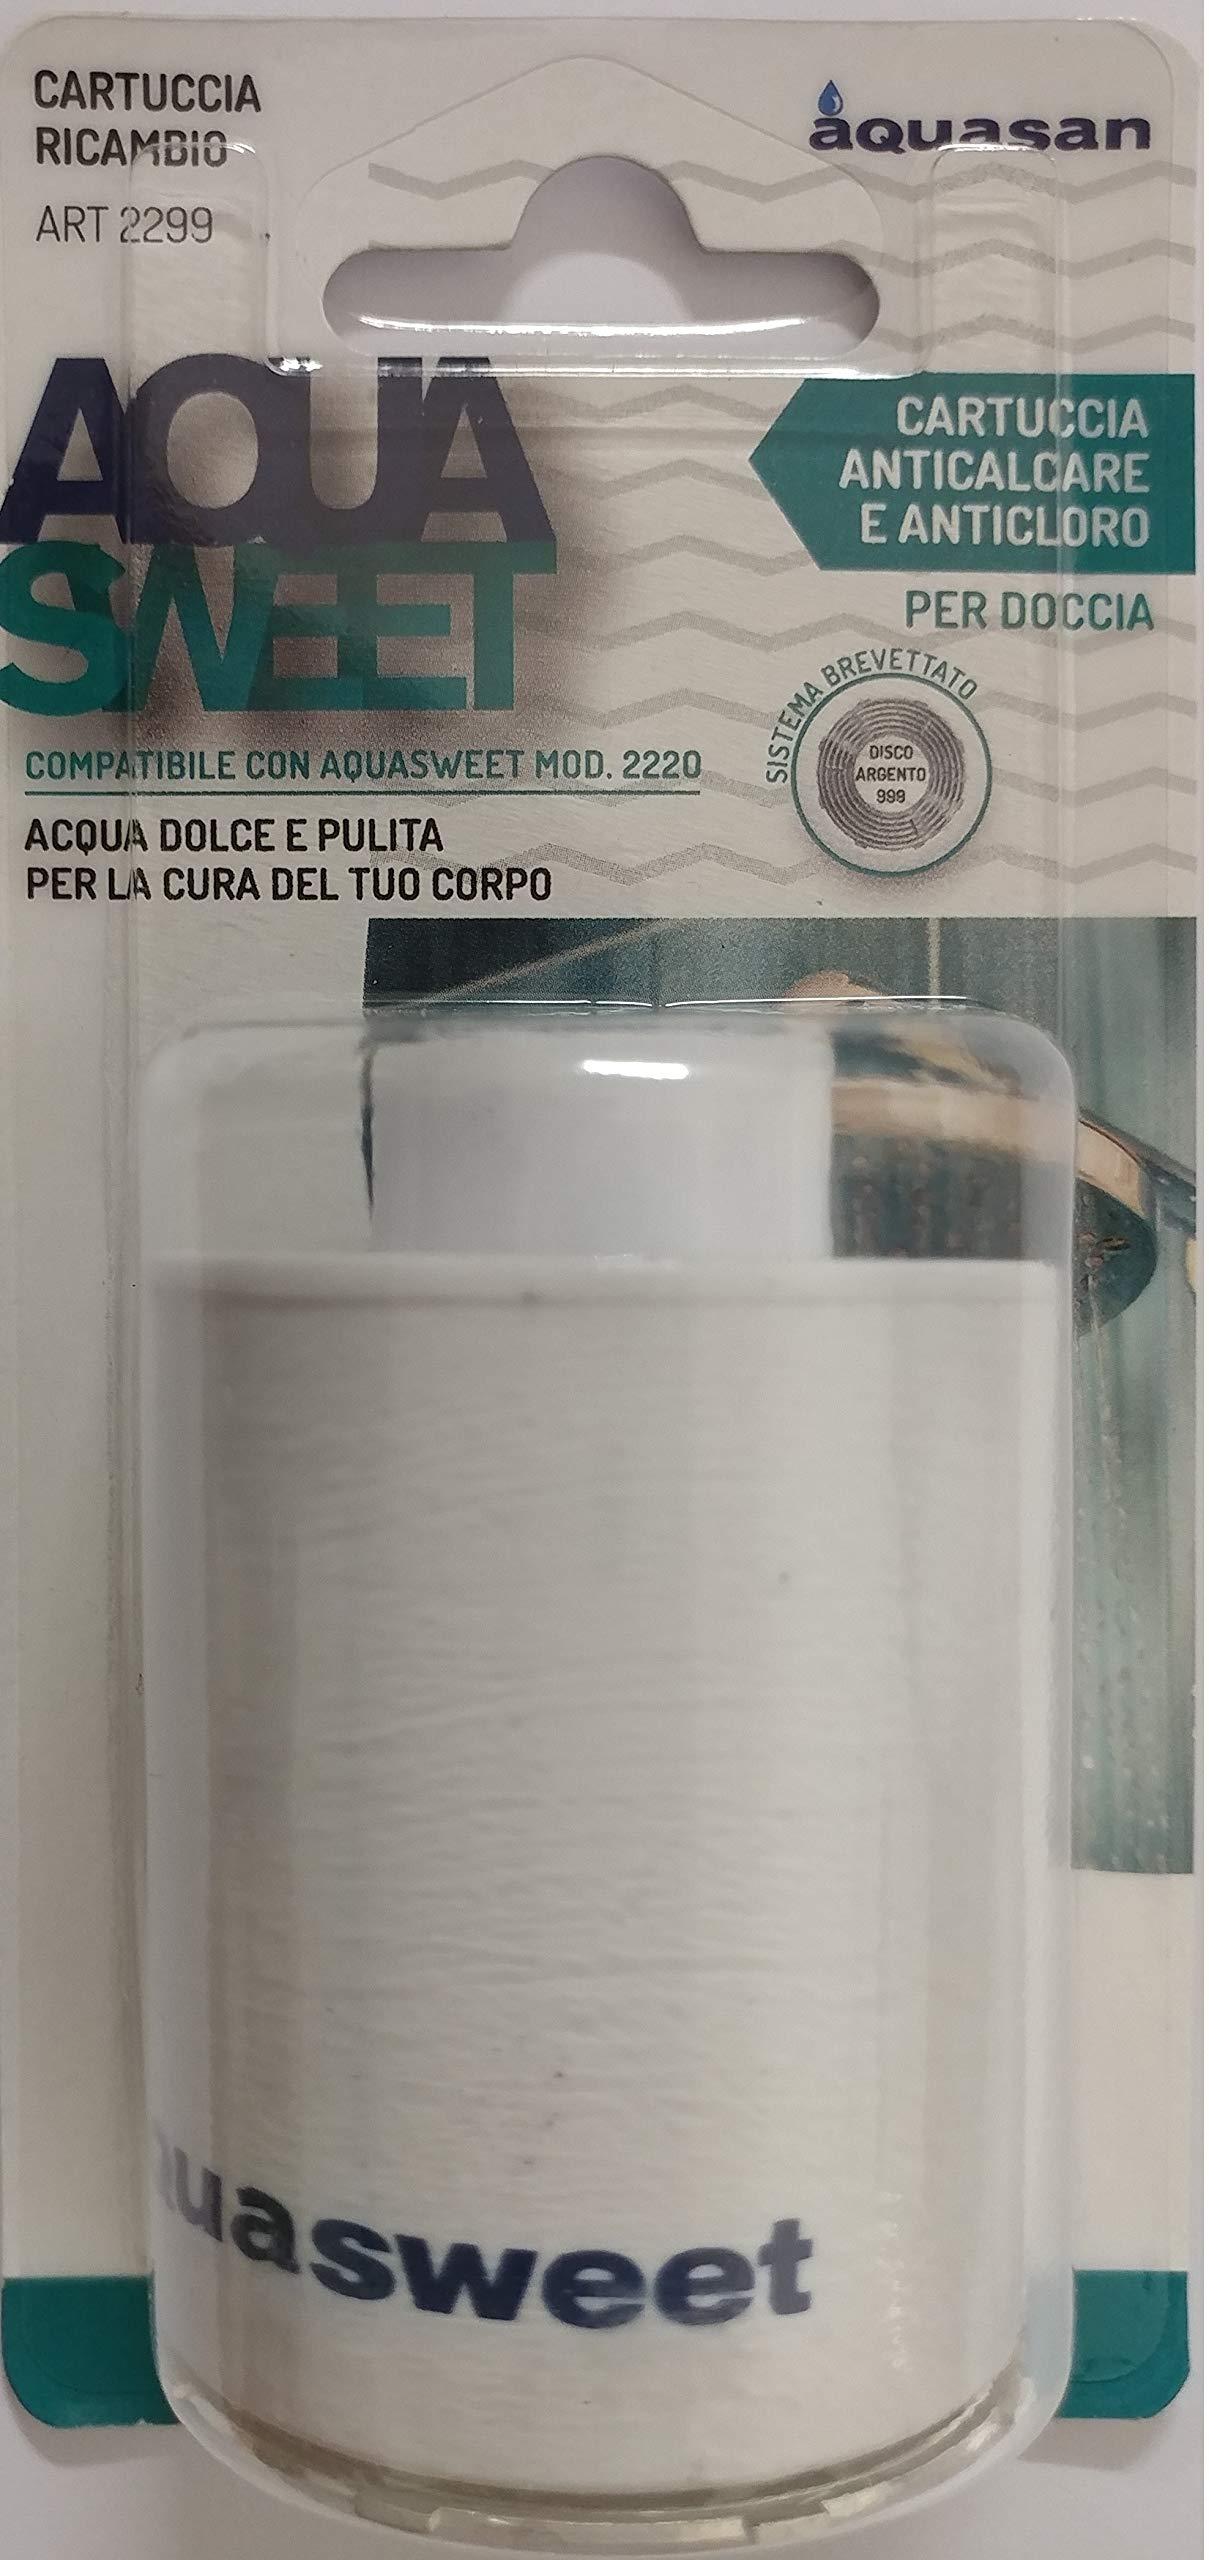 Aquasan 2299 - Cartucho de repuesto para filtro de ducha Aquasweet ...